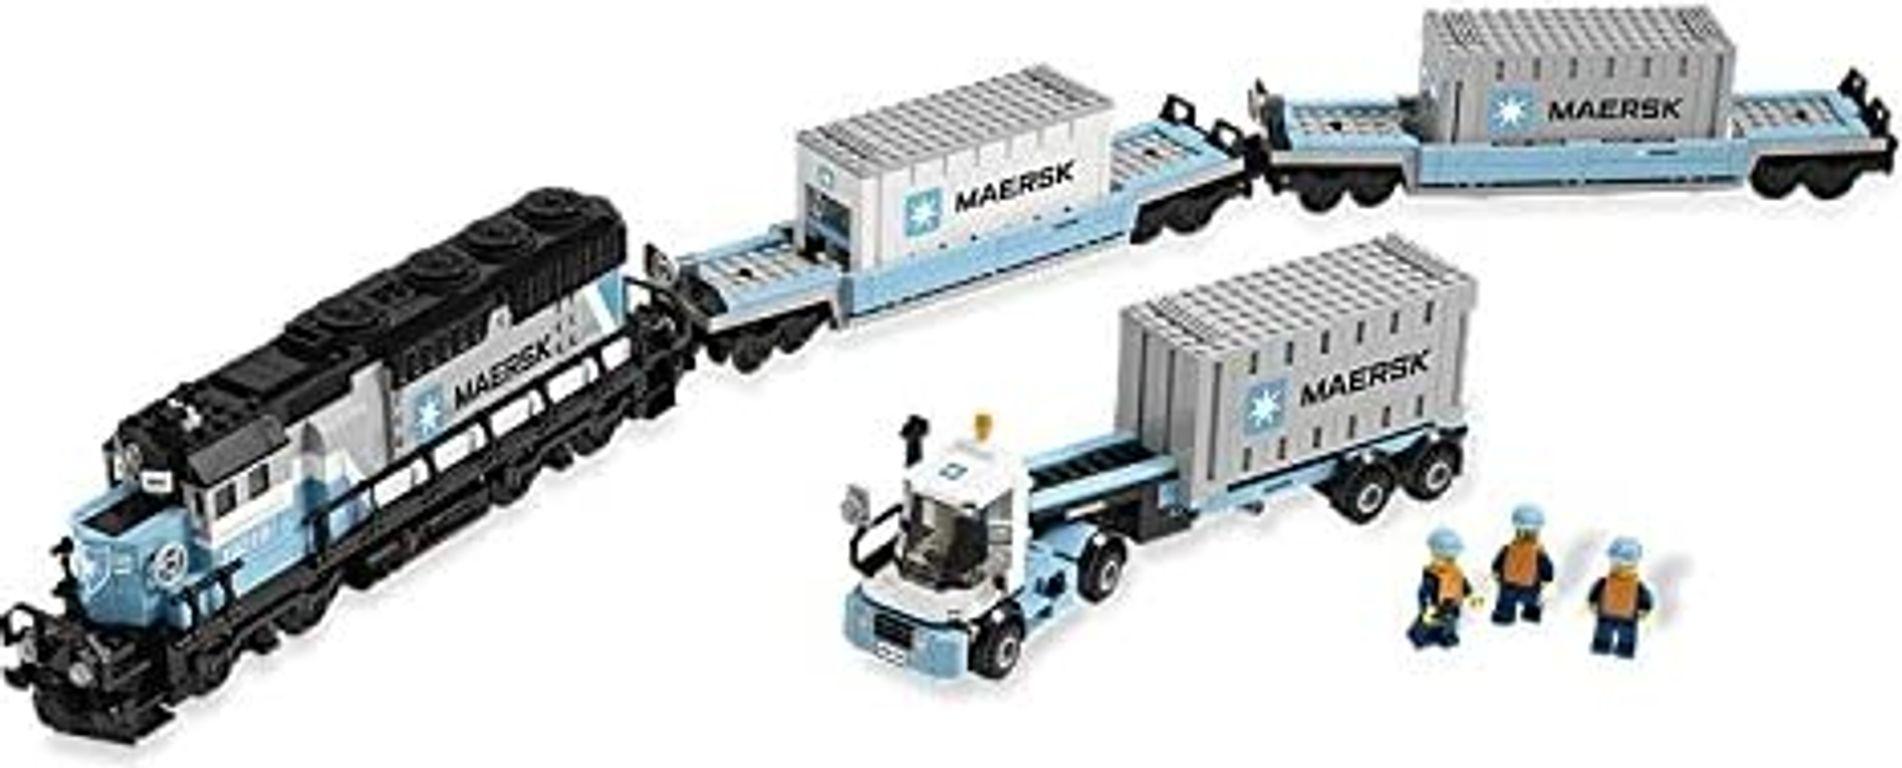 Maersk Train components